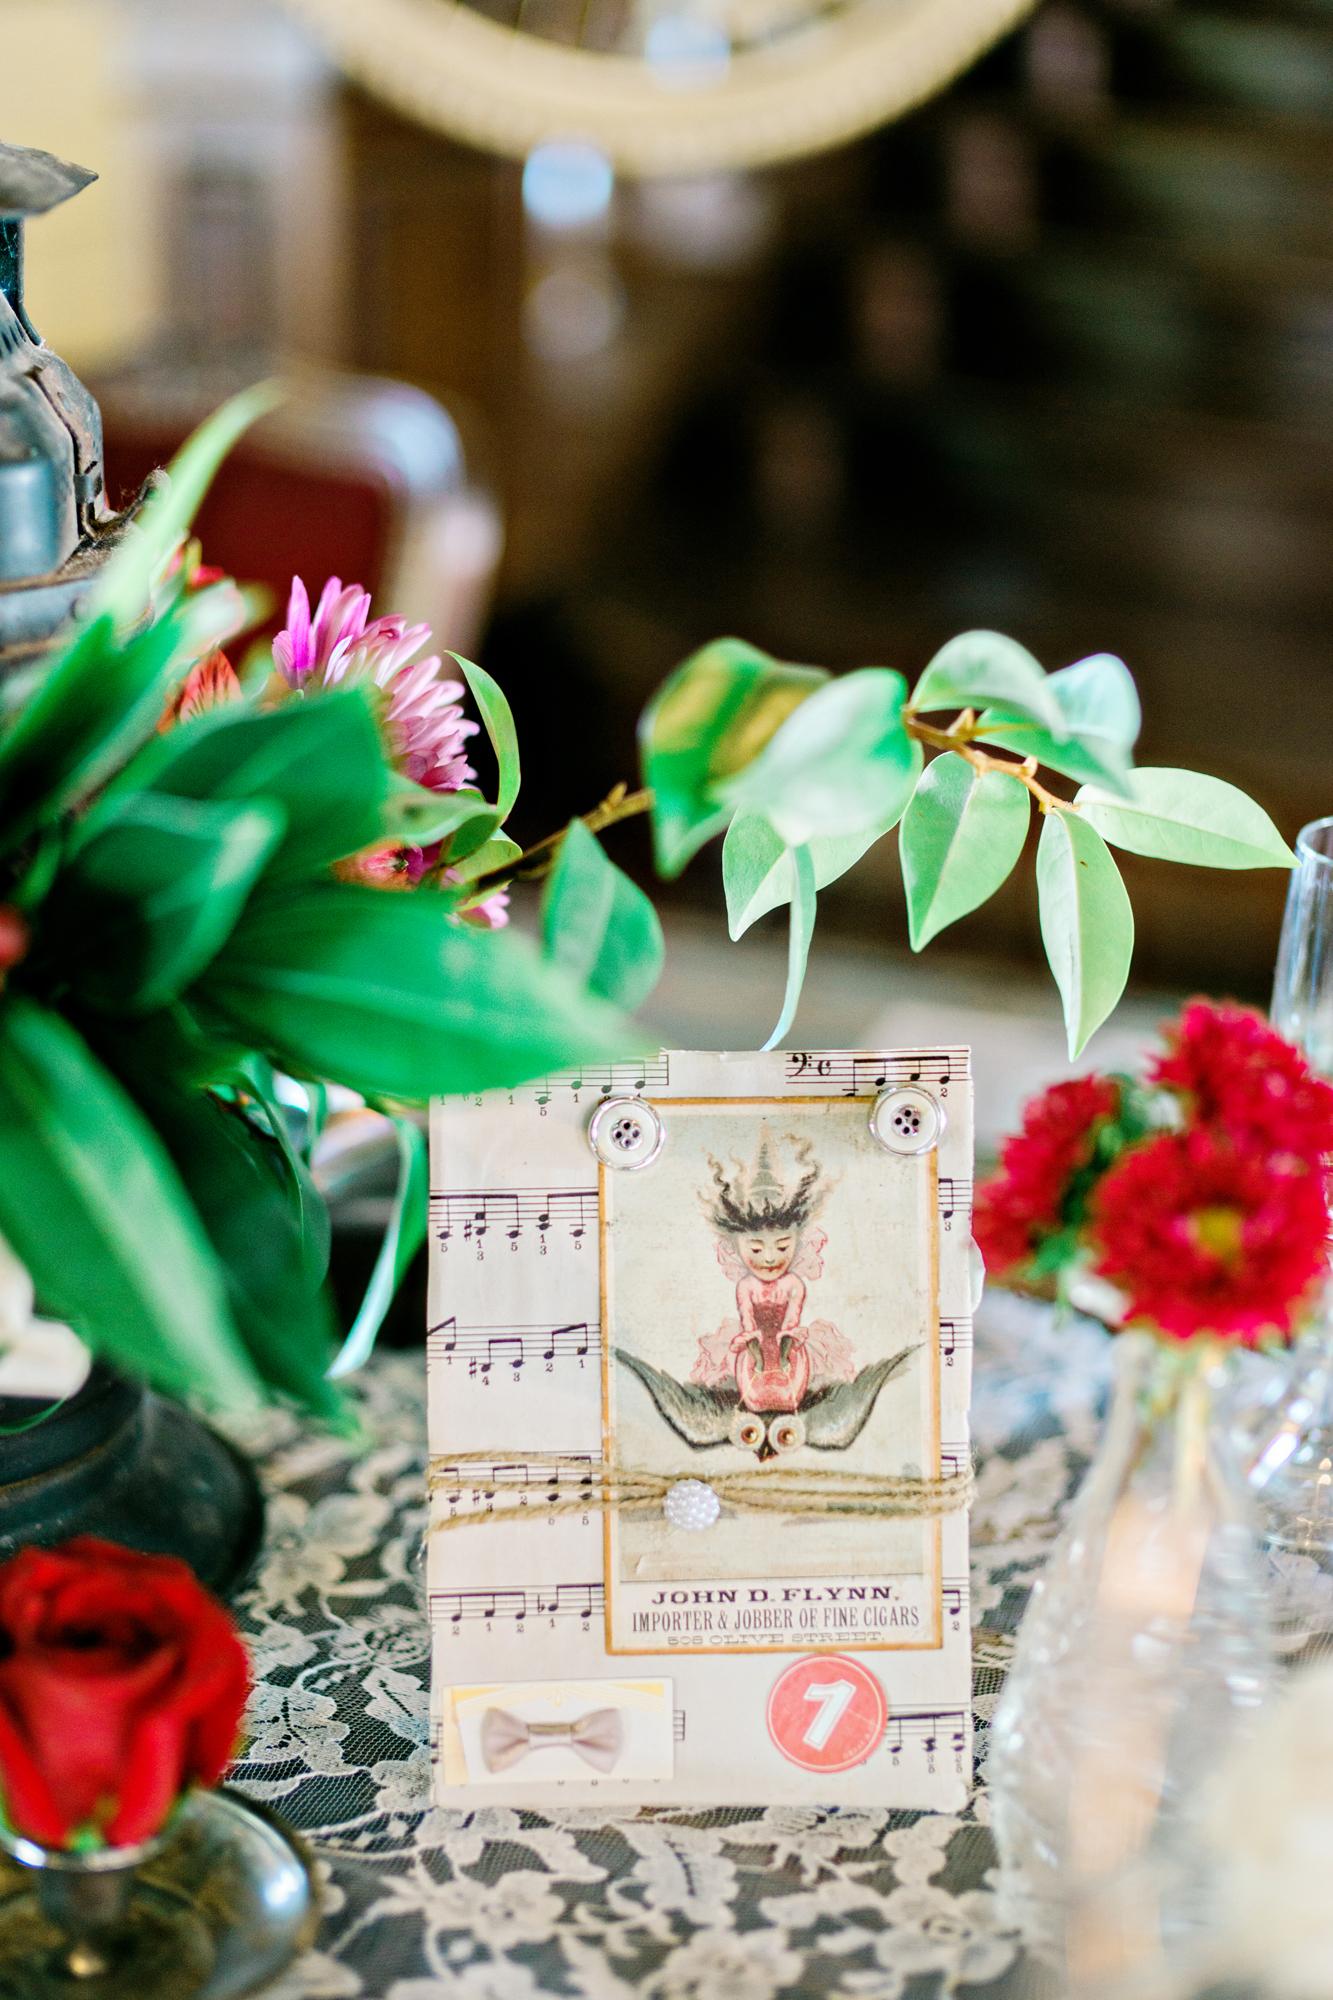 Newsies Wedding at Summerour Studio - Andie Freeman Photography